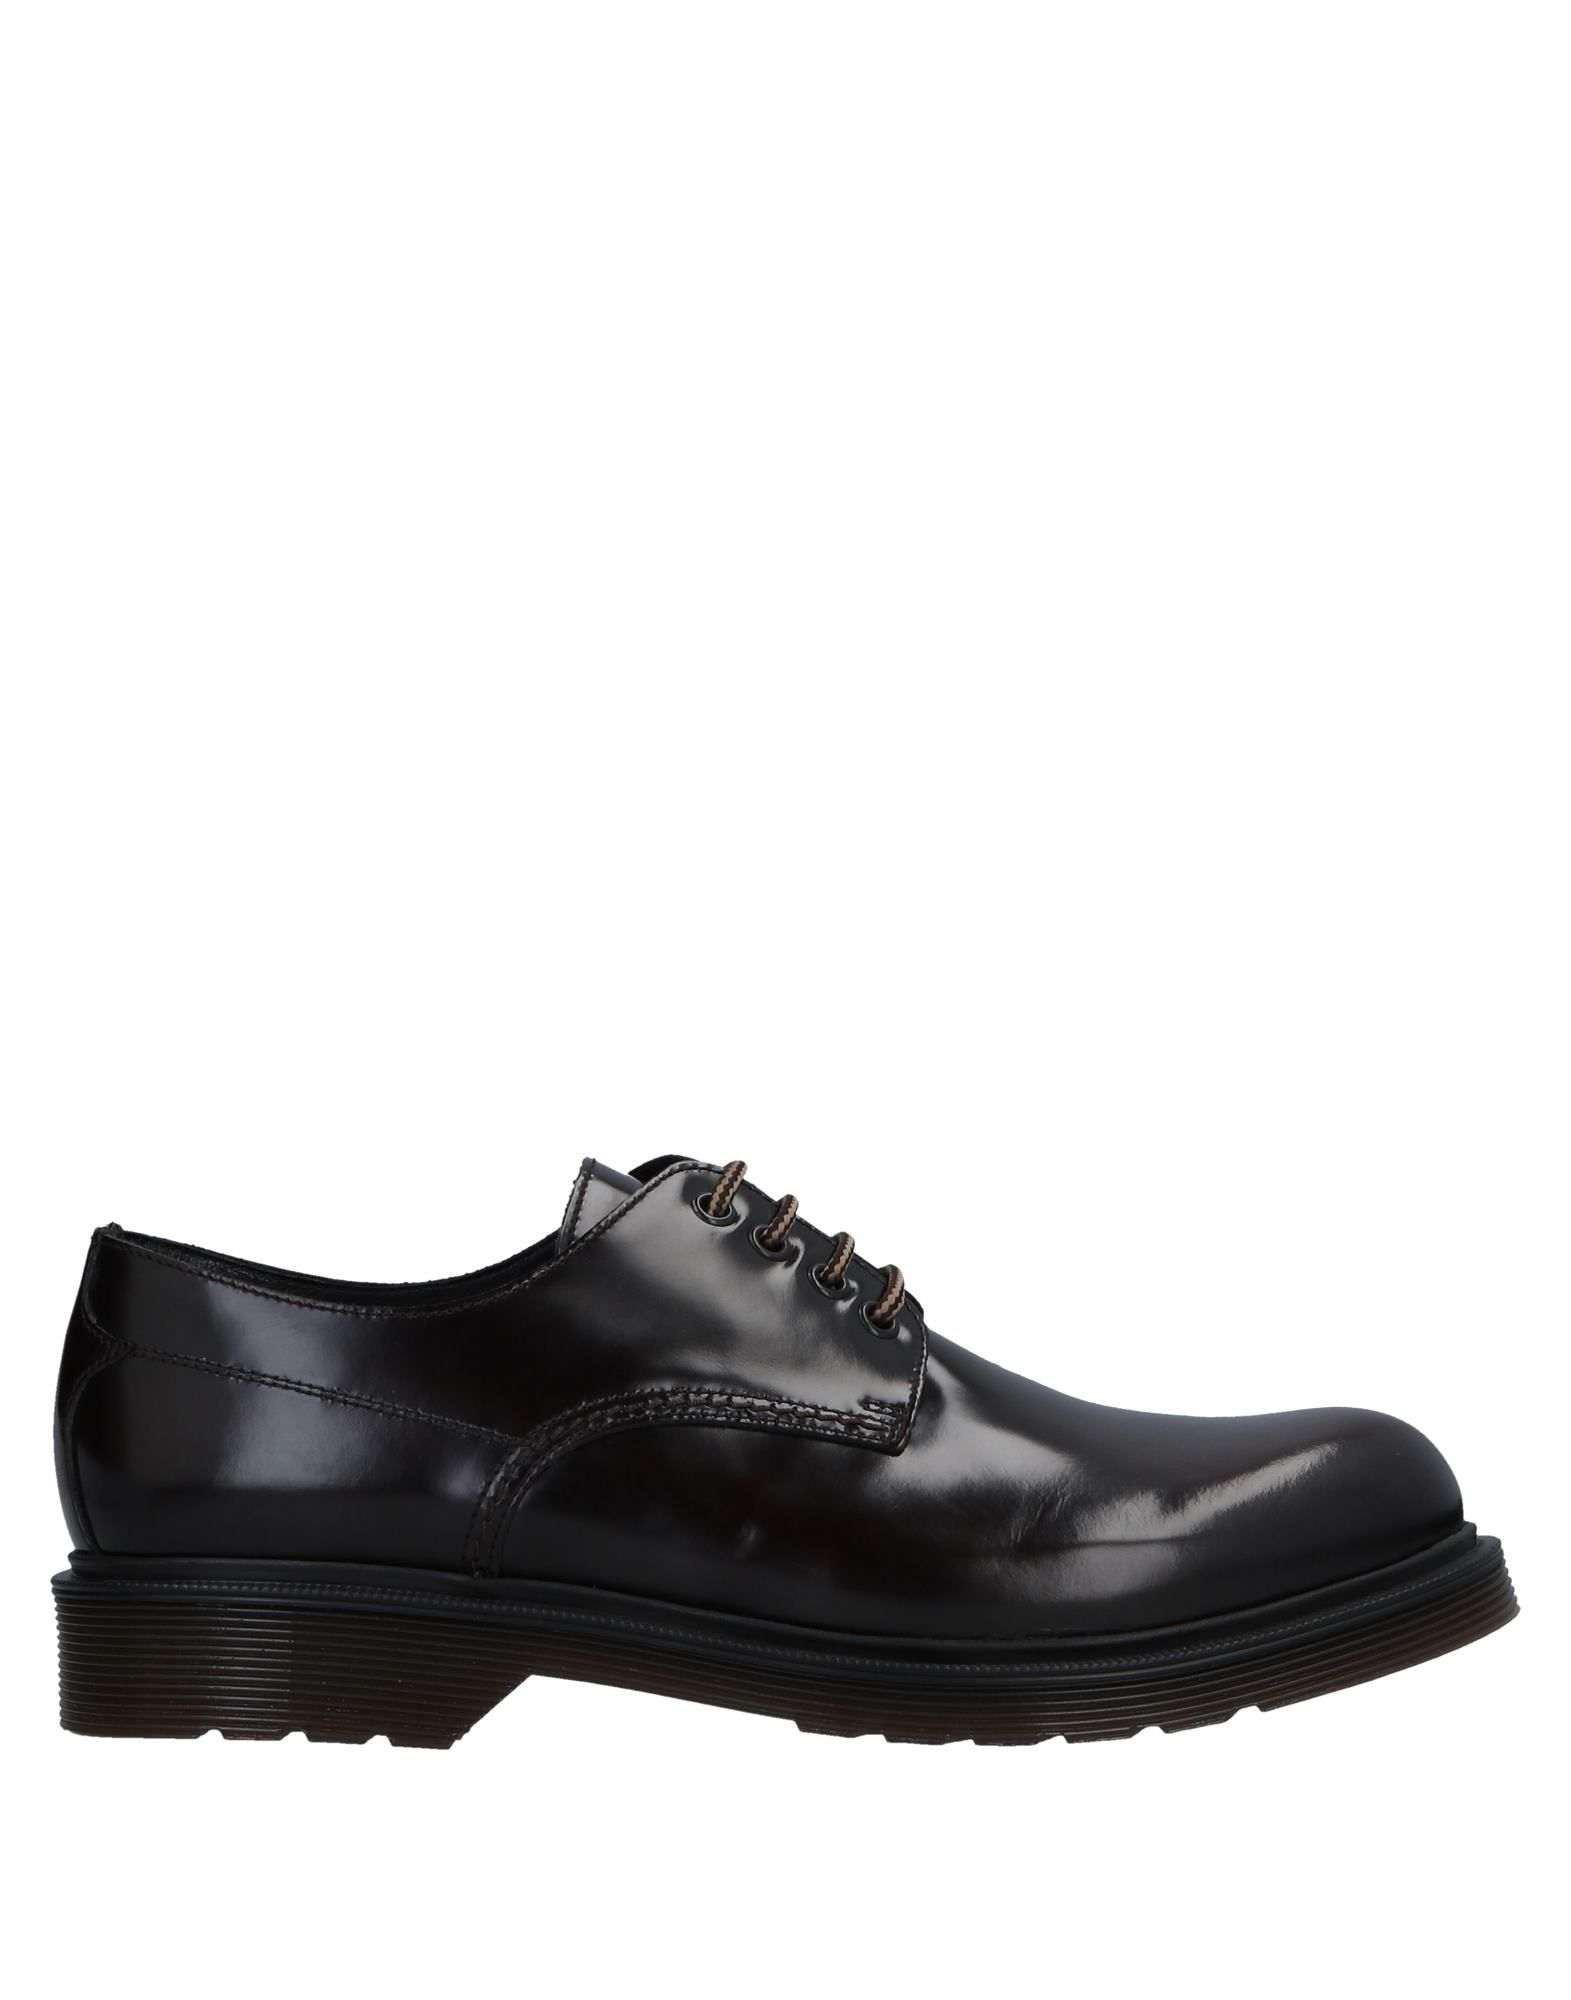 Rabatt echte Schuhe Zanfrini Cantù Schnürschuhe Herren  11535012VD